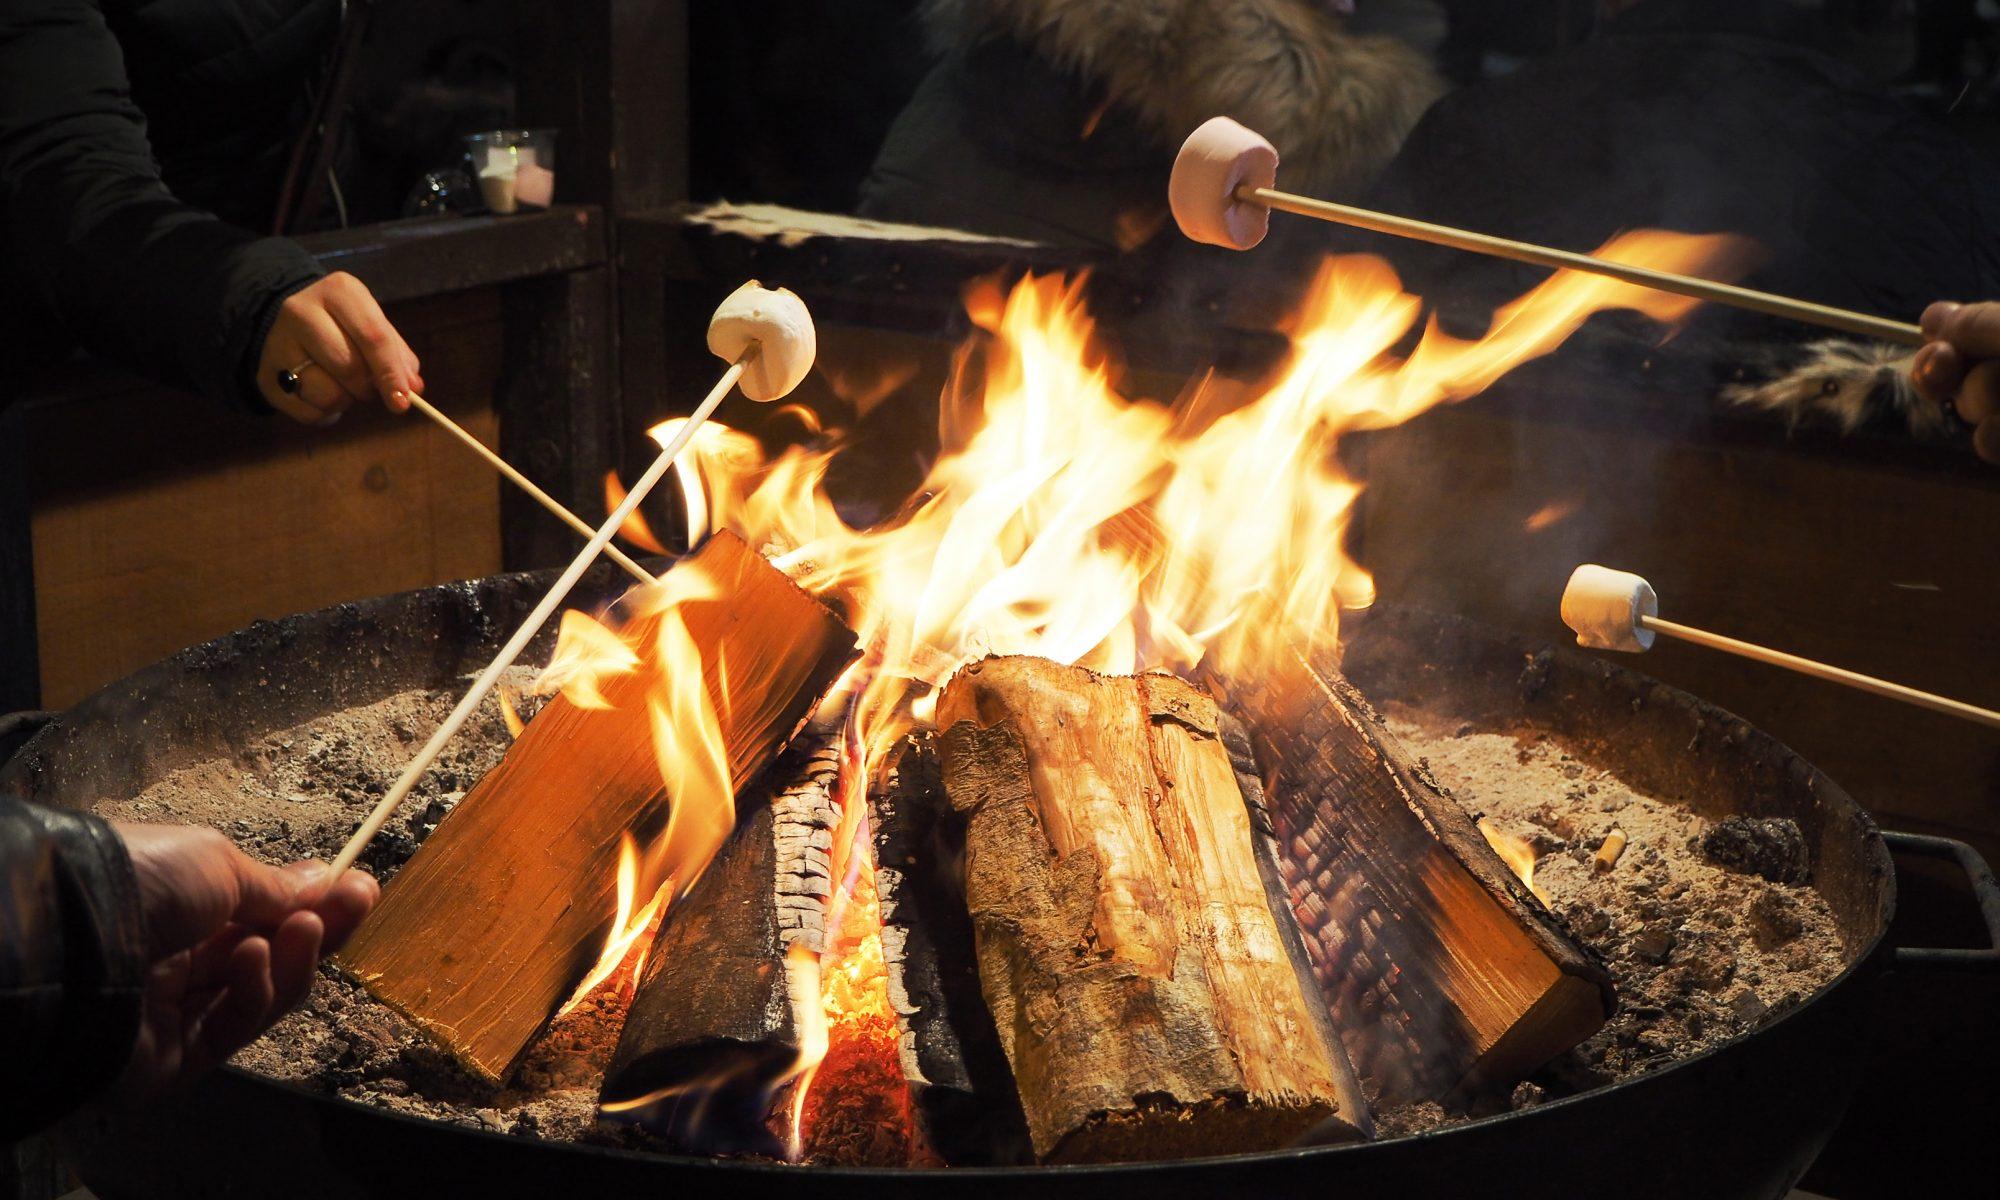 People,Roasting,Marshmallows,Around,Fireplace,,Enjoying,Their,Holiday